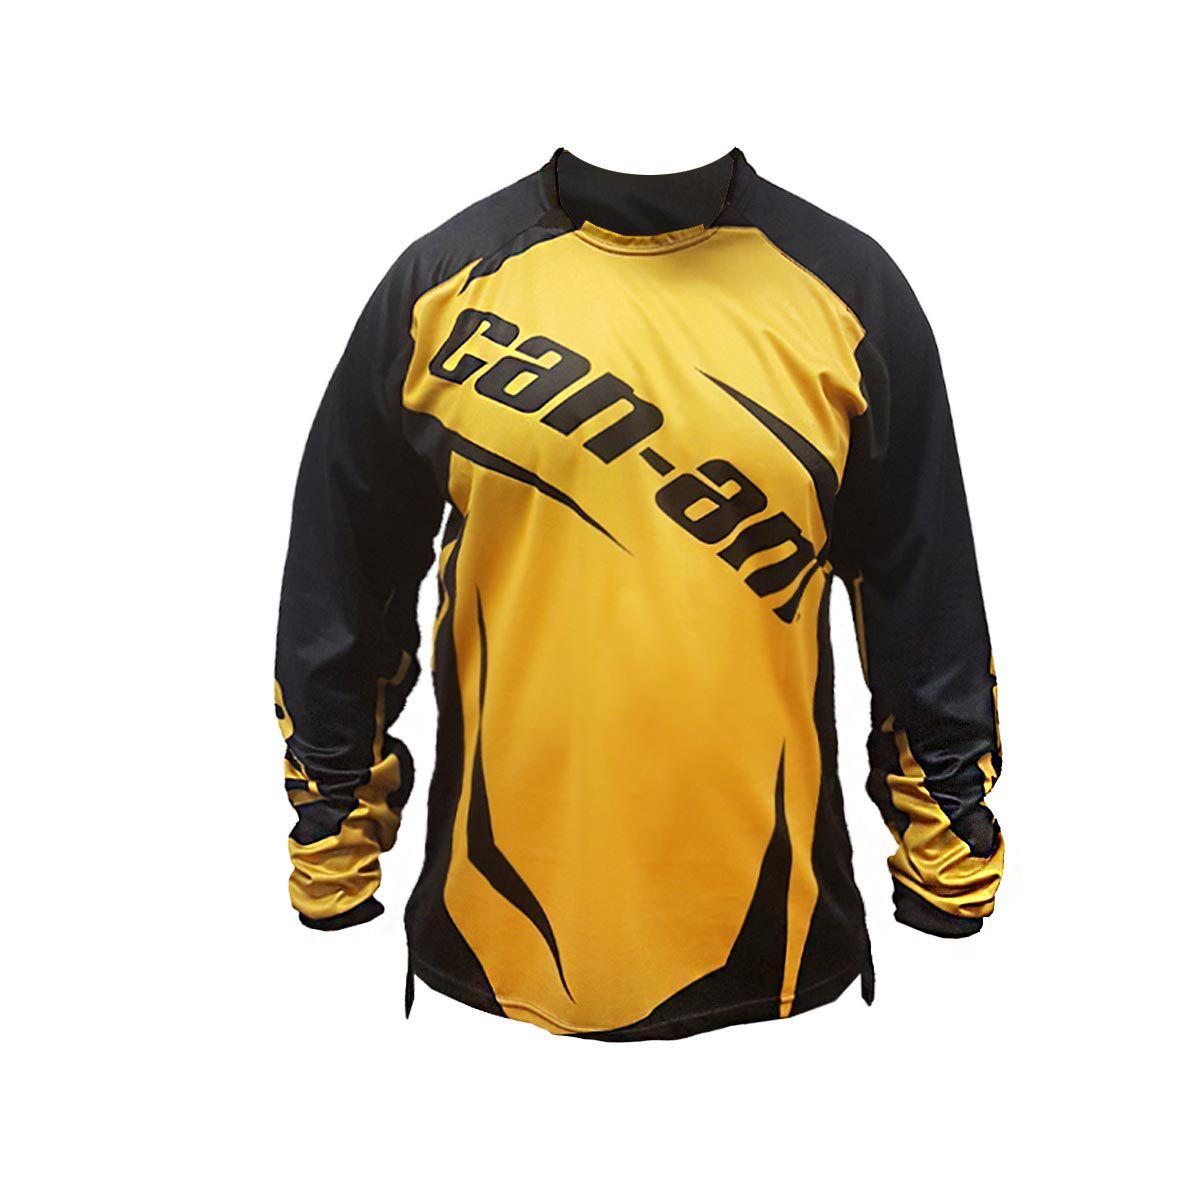 Camisa Can-Am Team Masculina Amarela